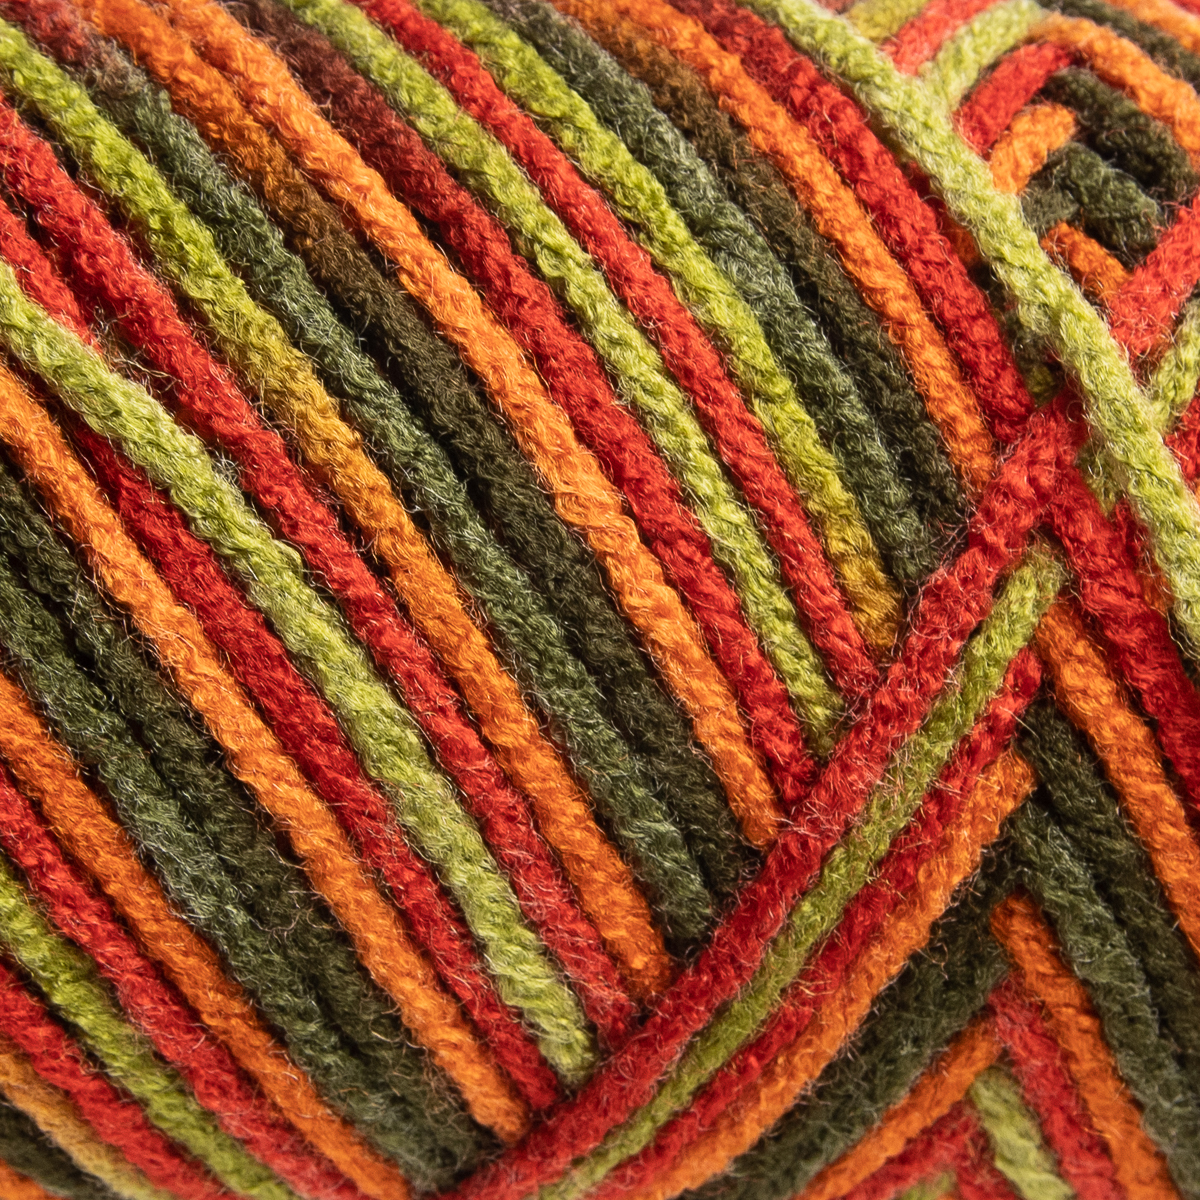 Red-Heart-With-Love-100-Acrylic-Yarn-Knitting-Crochet-Medium-4-Skein-Soft thumbnail 15